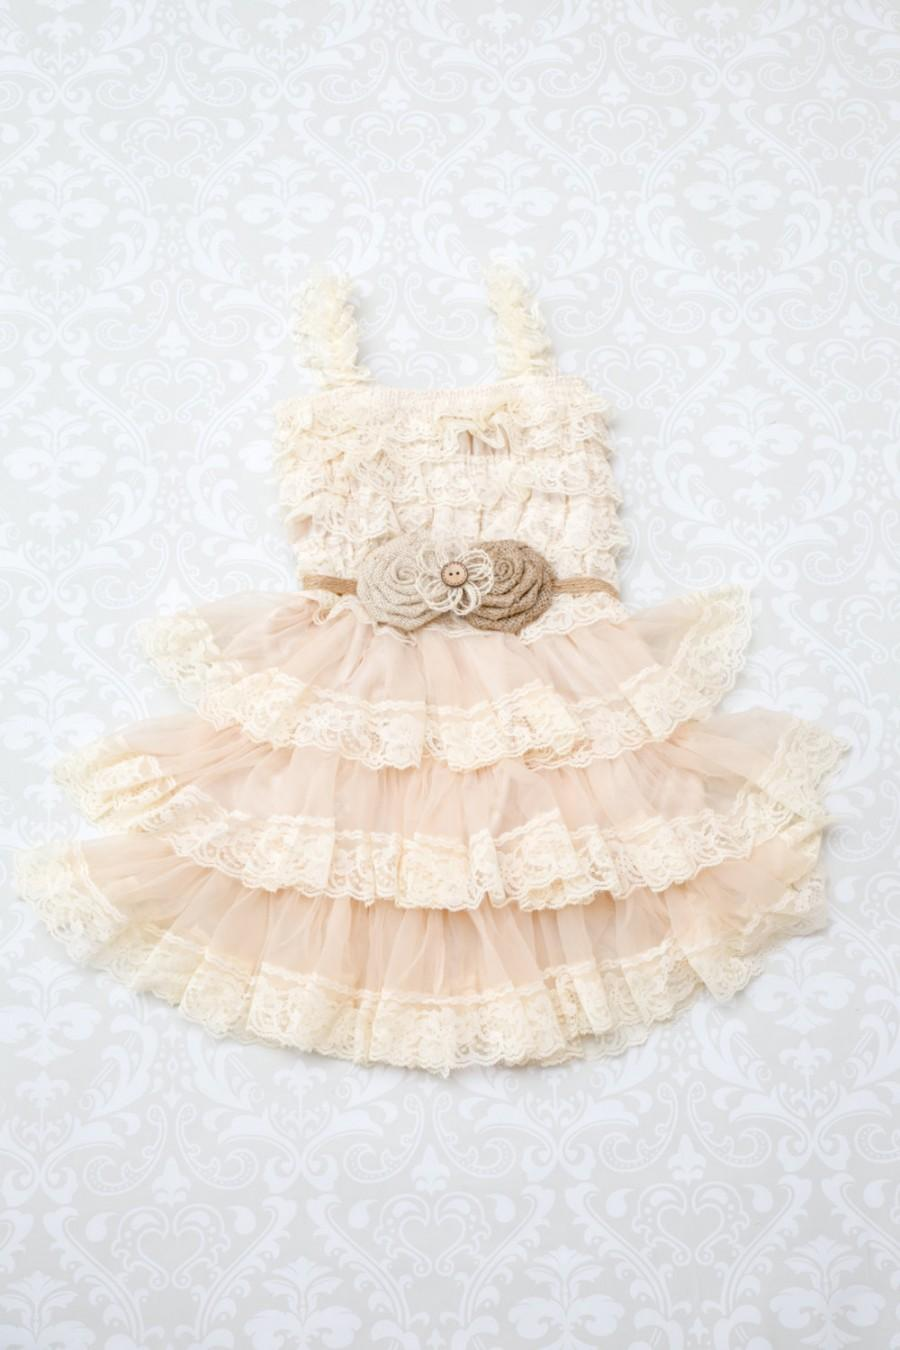 Свадьба - Rustic Burlap Flower Girl Dress-Burlap Roses-Country Flower Girl Dress-Burlap Flower Girl Dress-Burlap Lace Wedding-Country Wedding